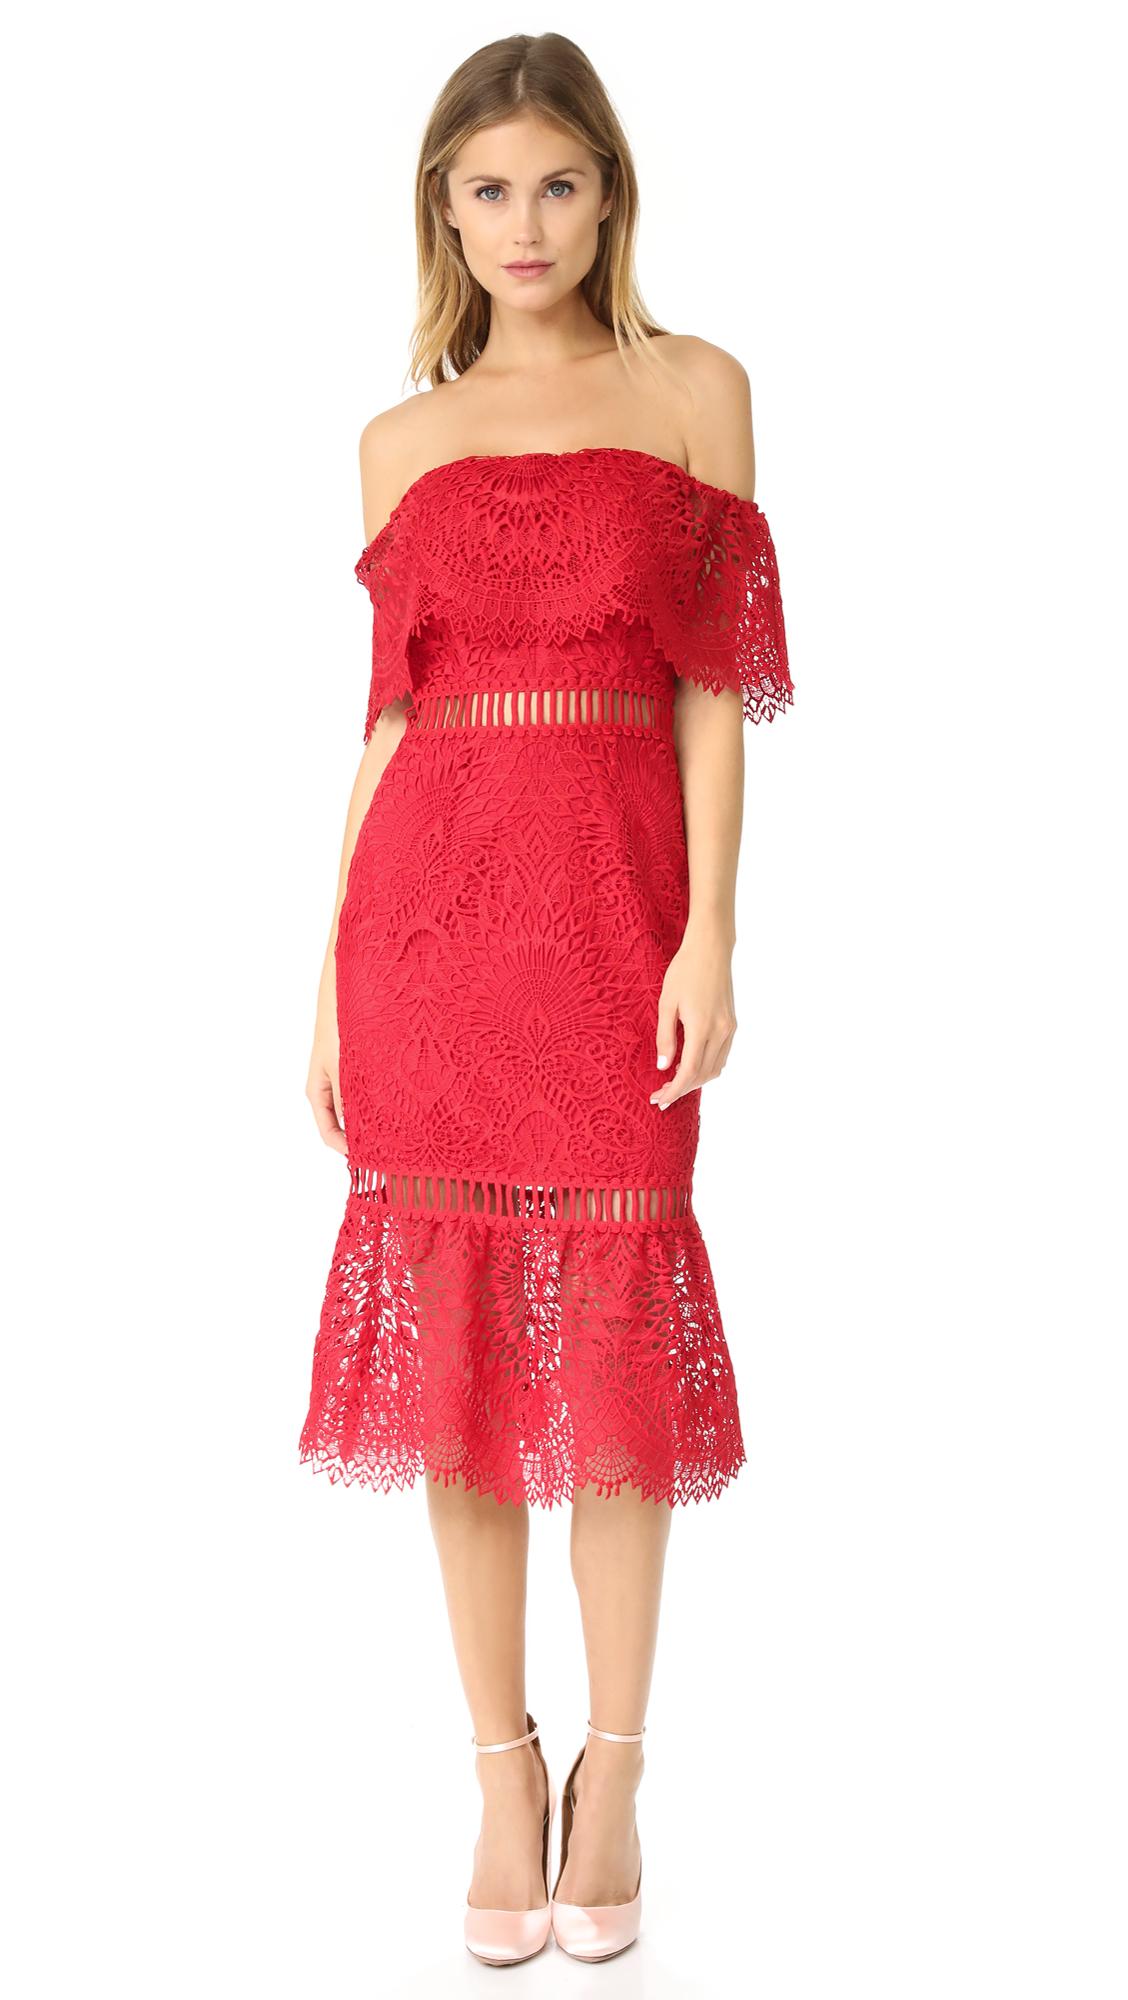 Saylor Cornelia Sistine Embroidery Dress - Red